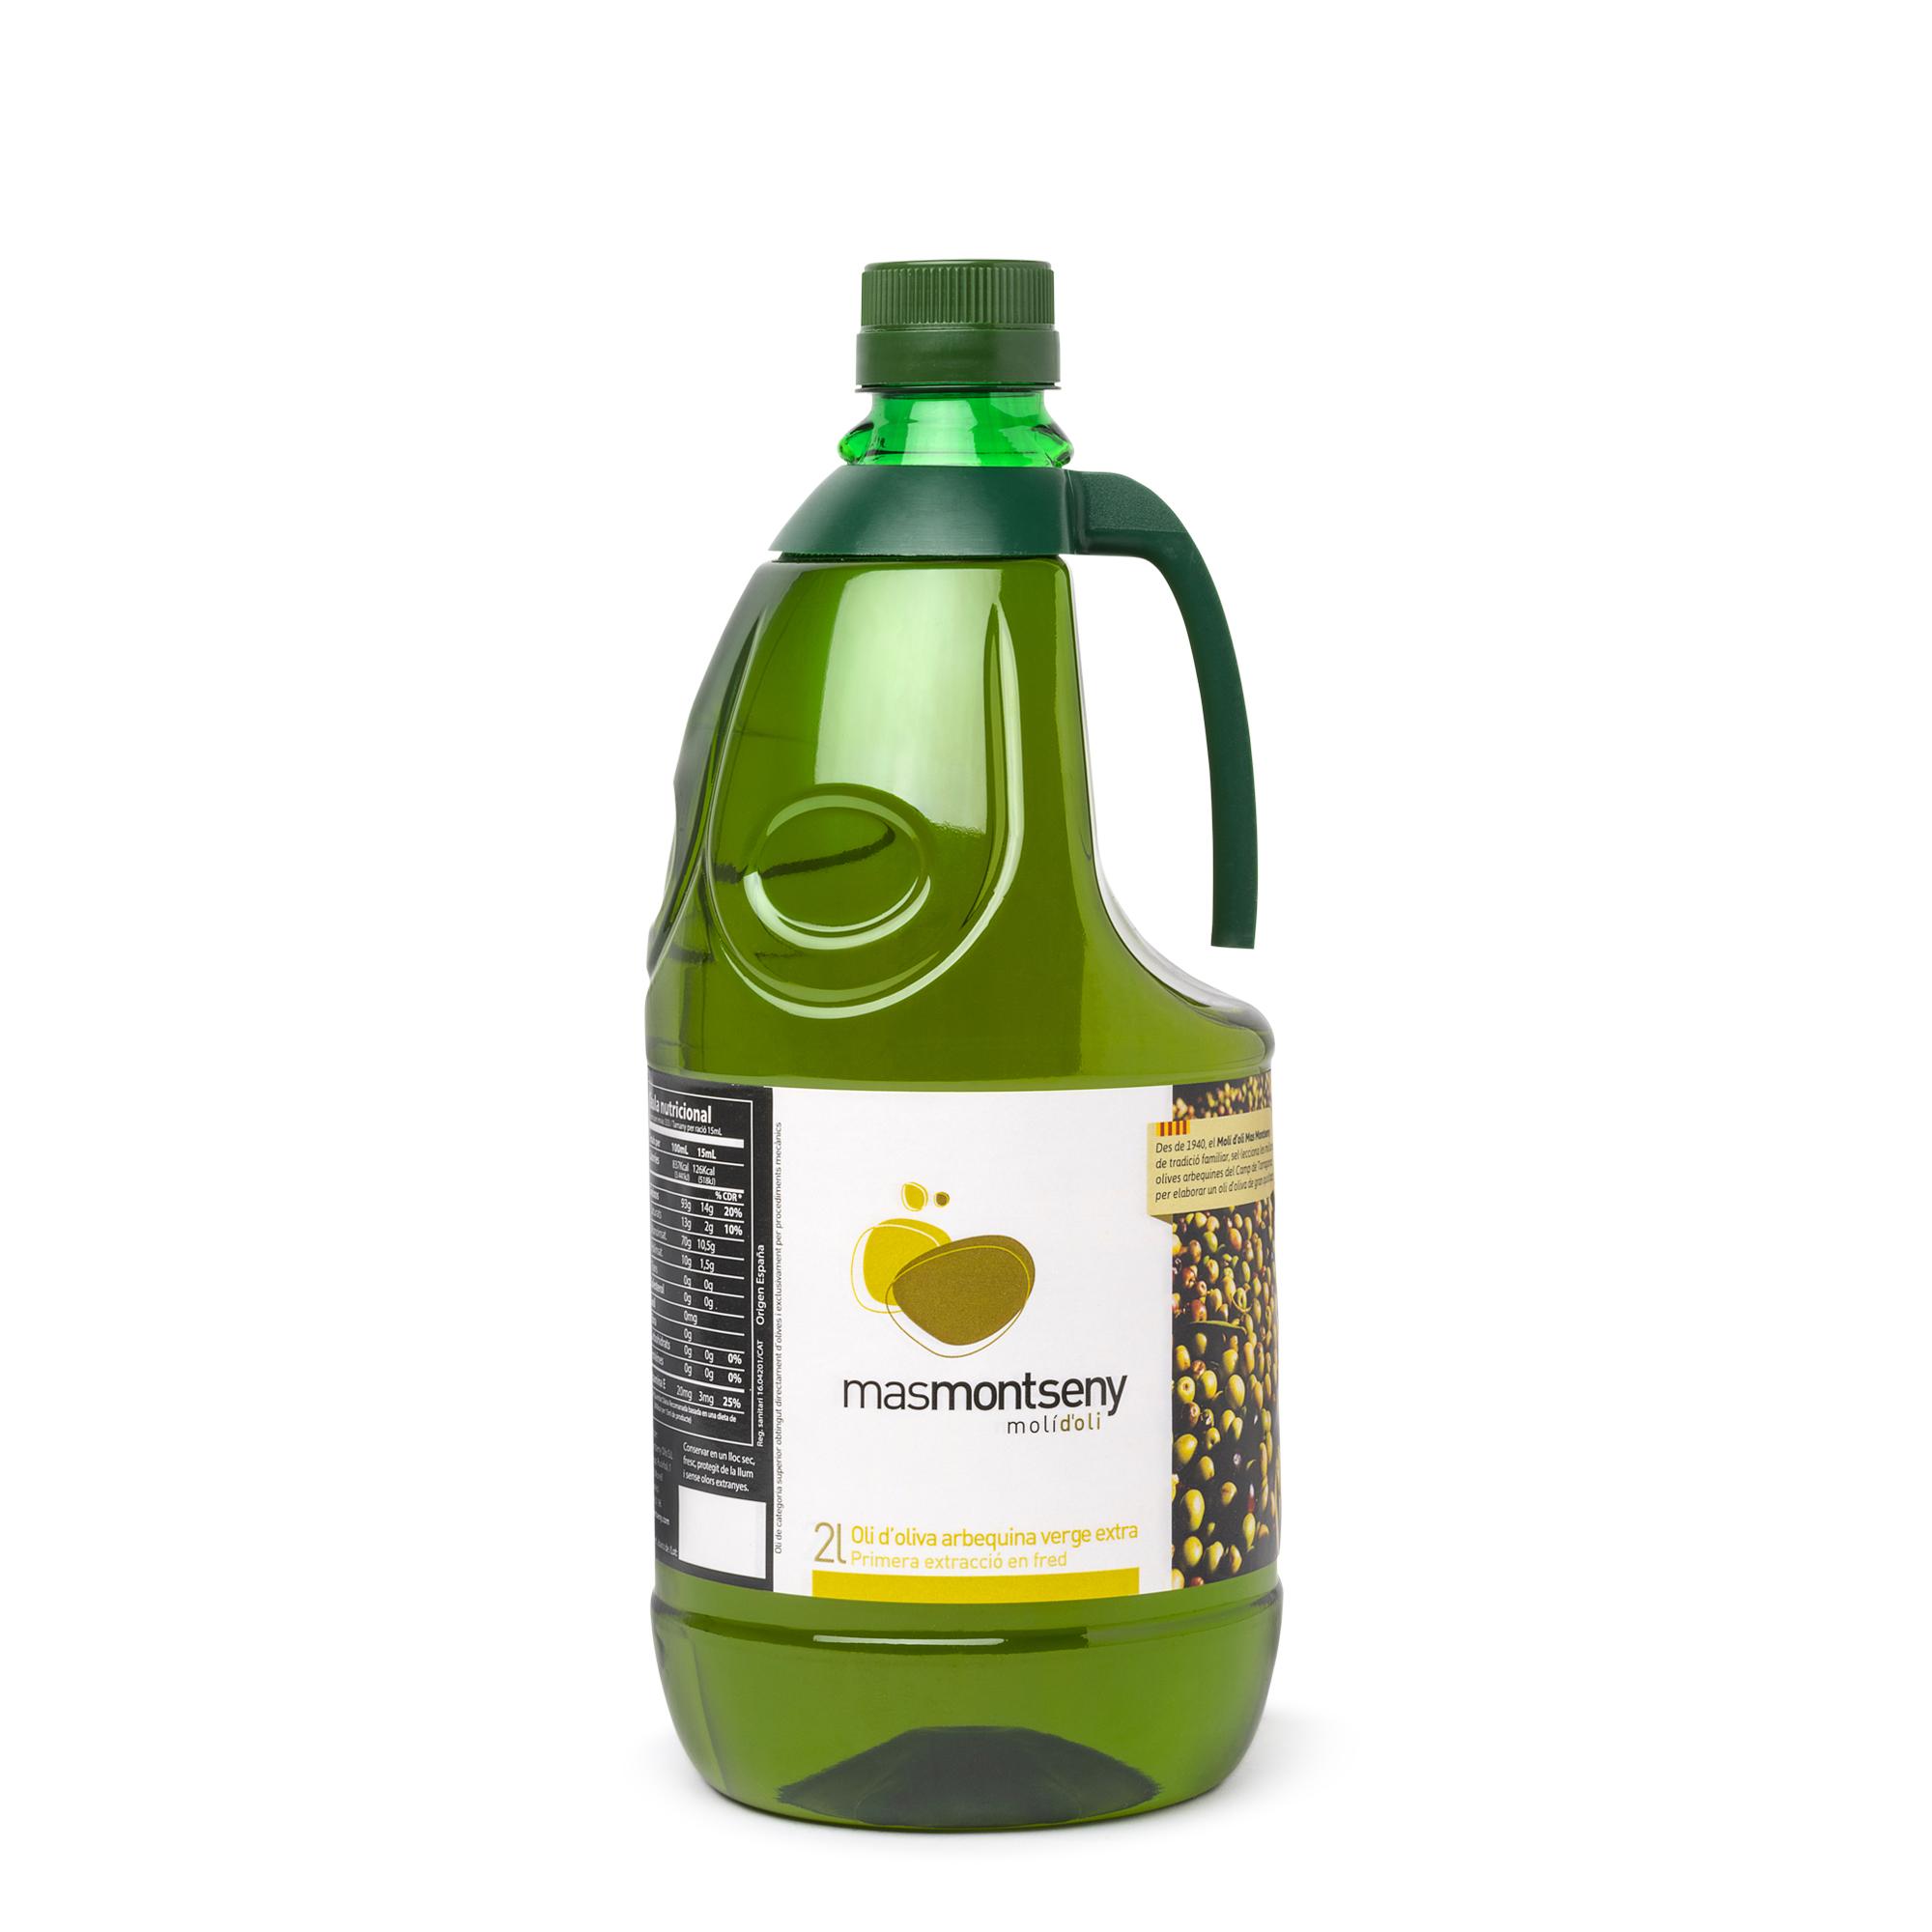 2L Oli d'oliva verge extra Mas Montseny 2020